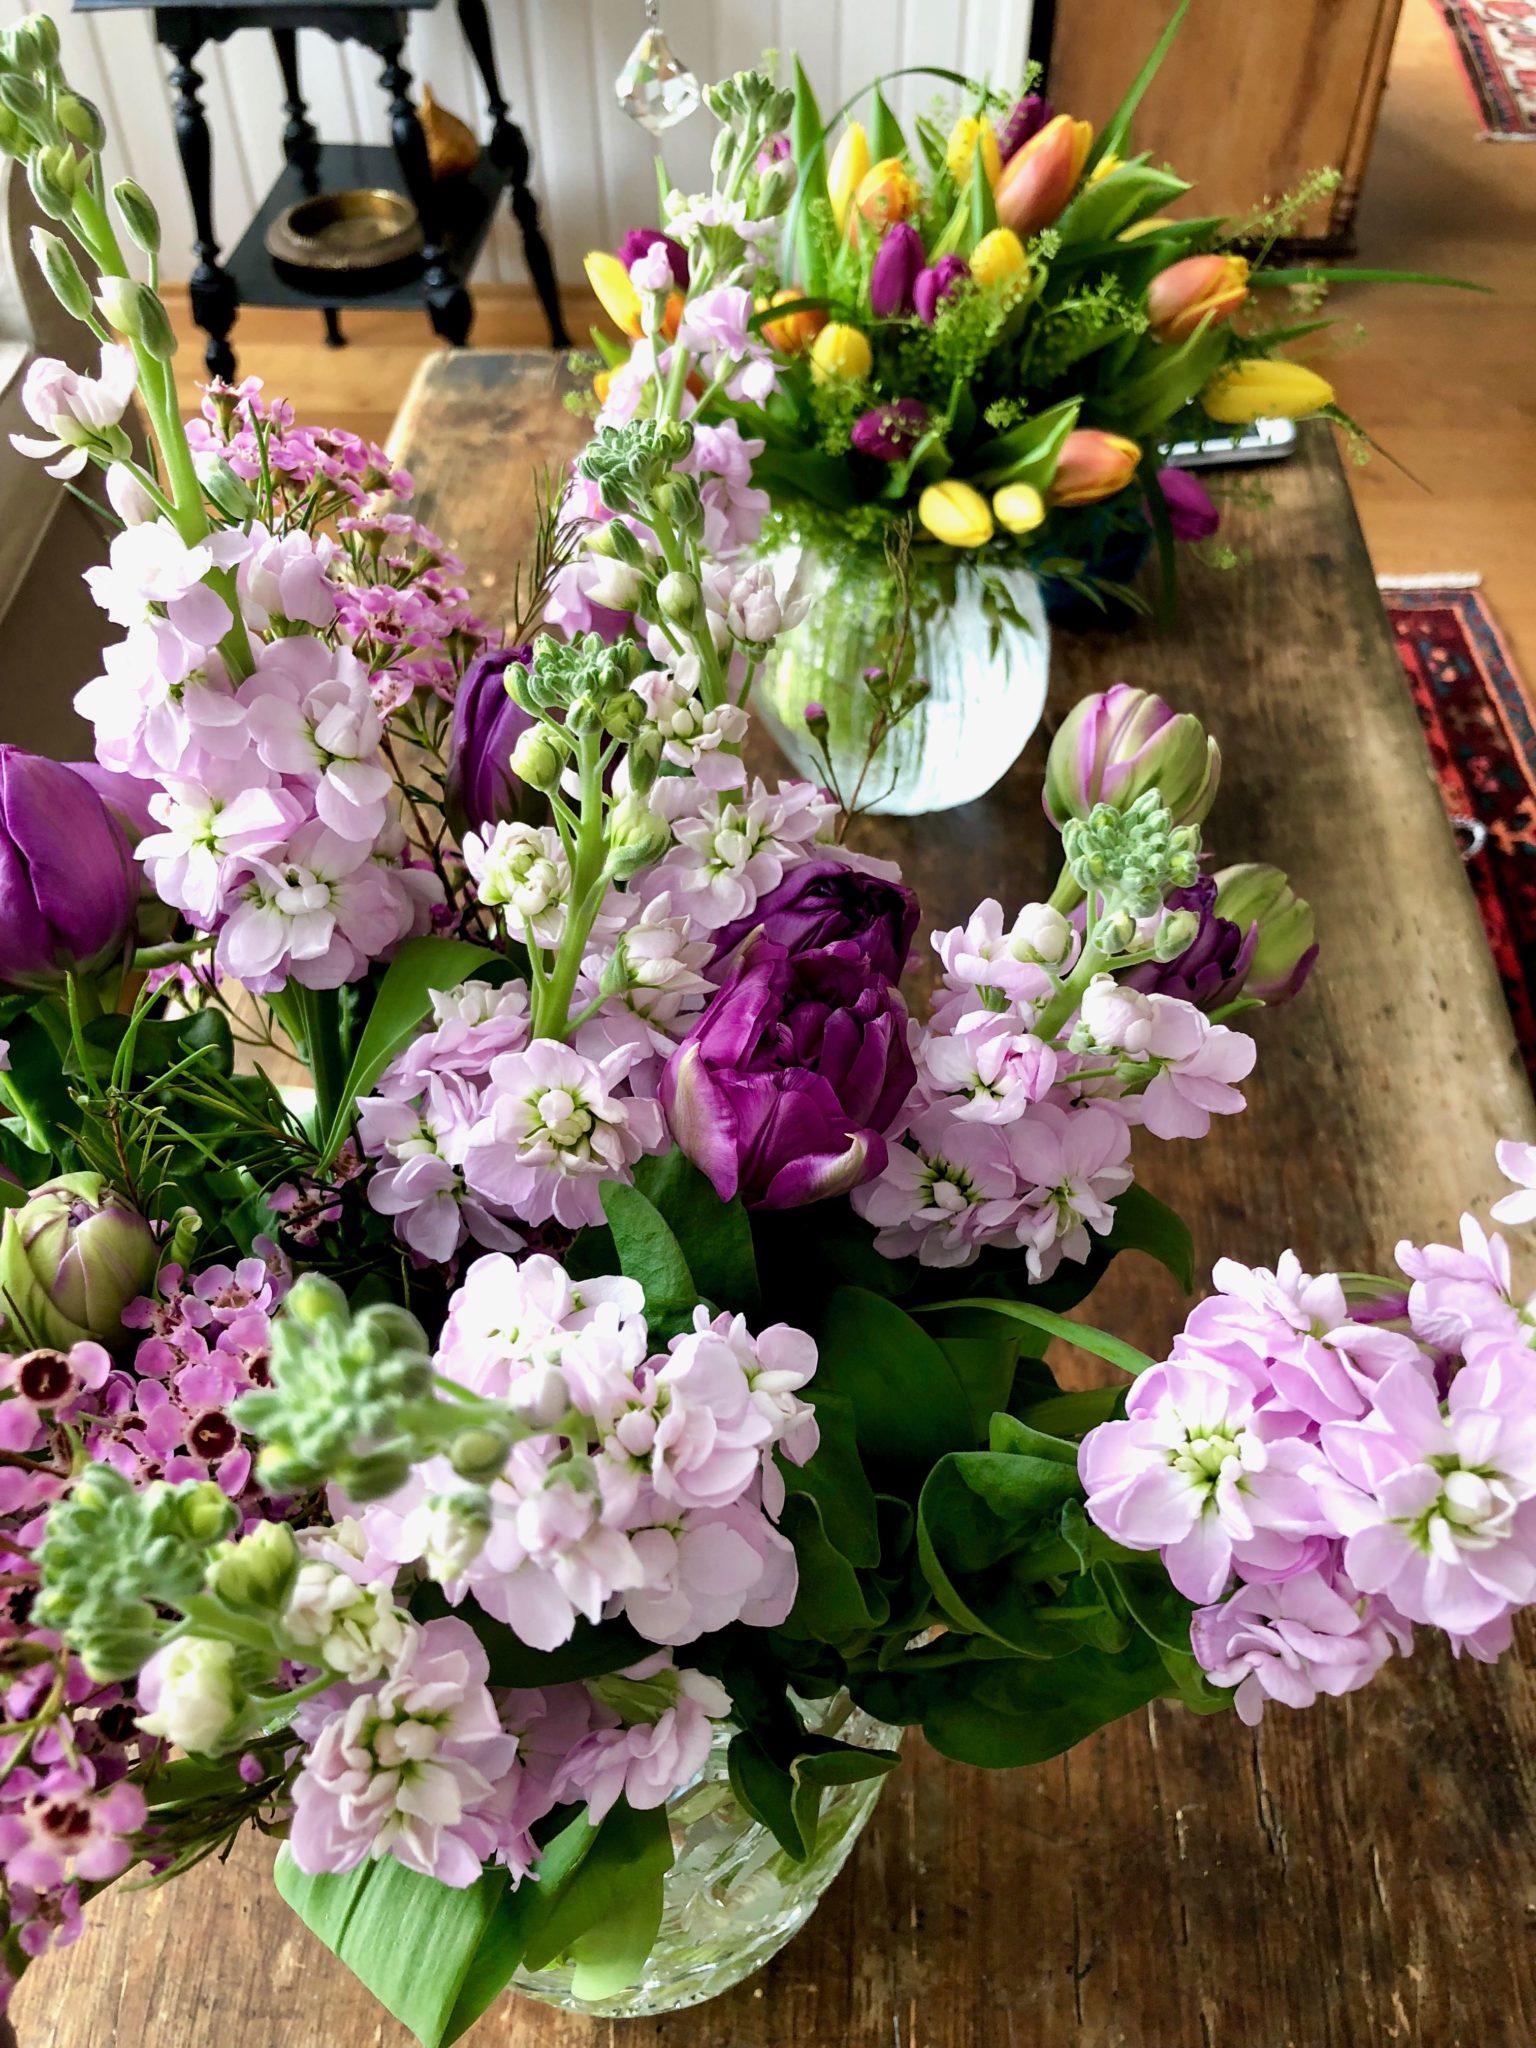 Tuoksuvia kukkia